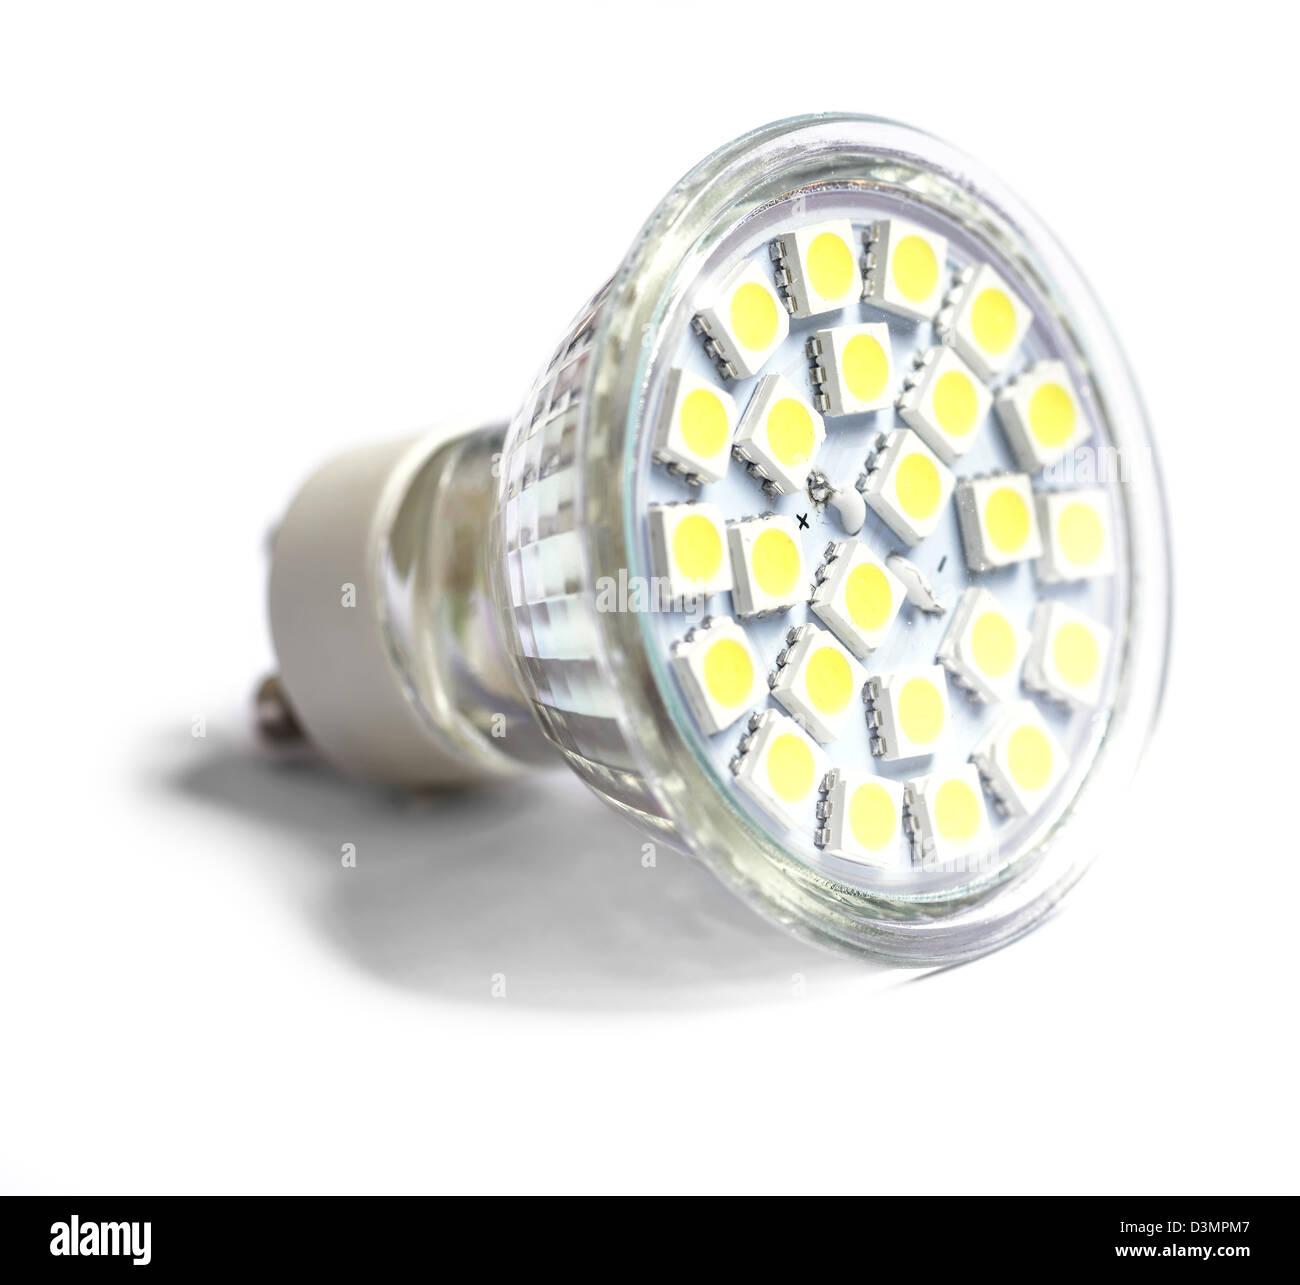 Niedrigenergie-LED-Scheinwerfer-Birne Stockbild